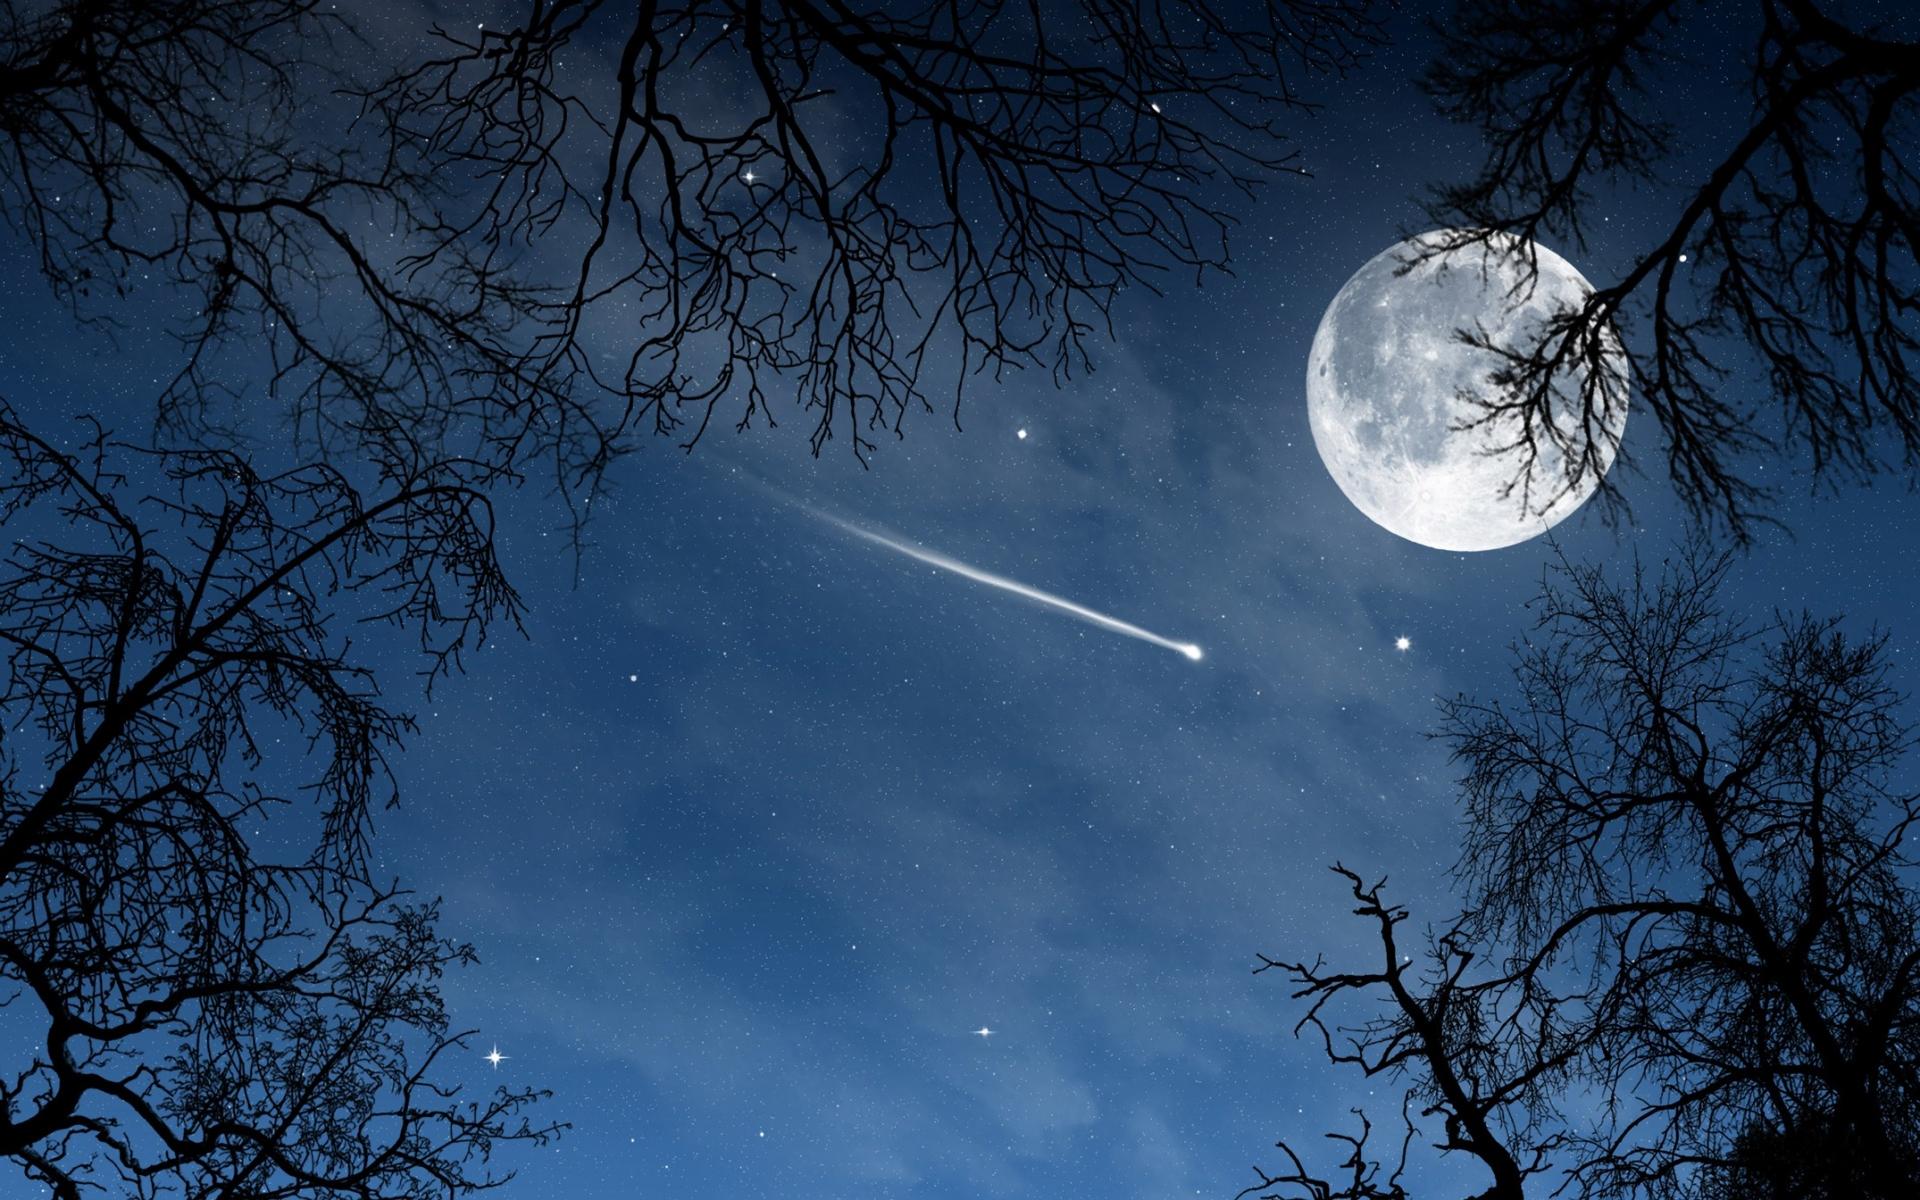 La luna llena y un cometa - 1920x1200